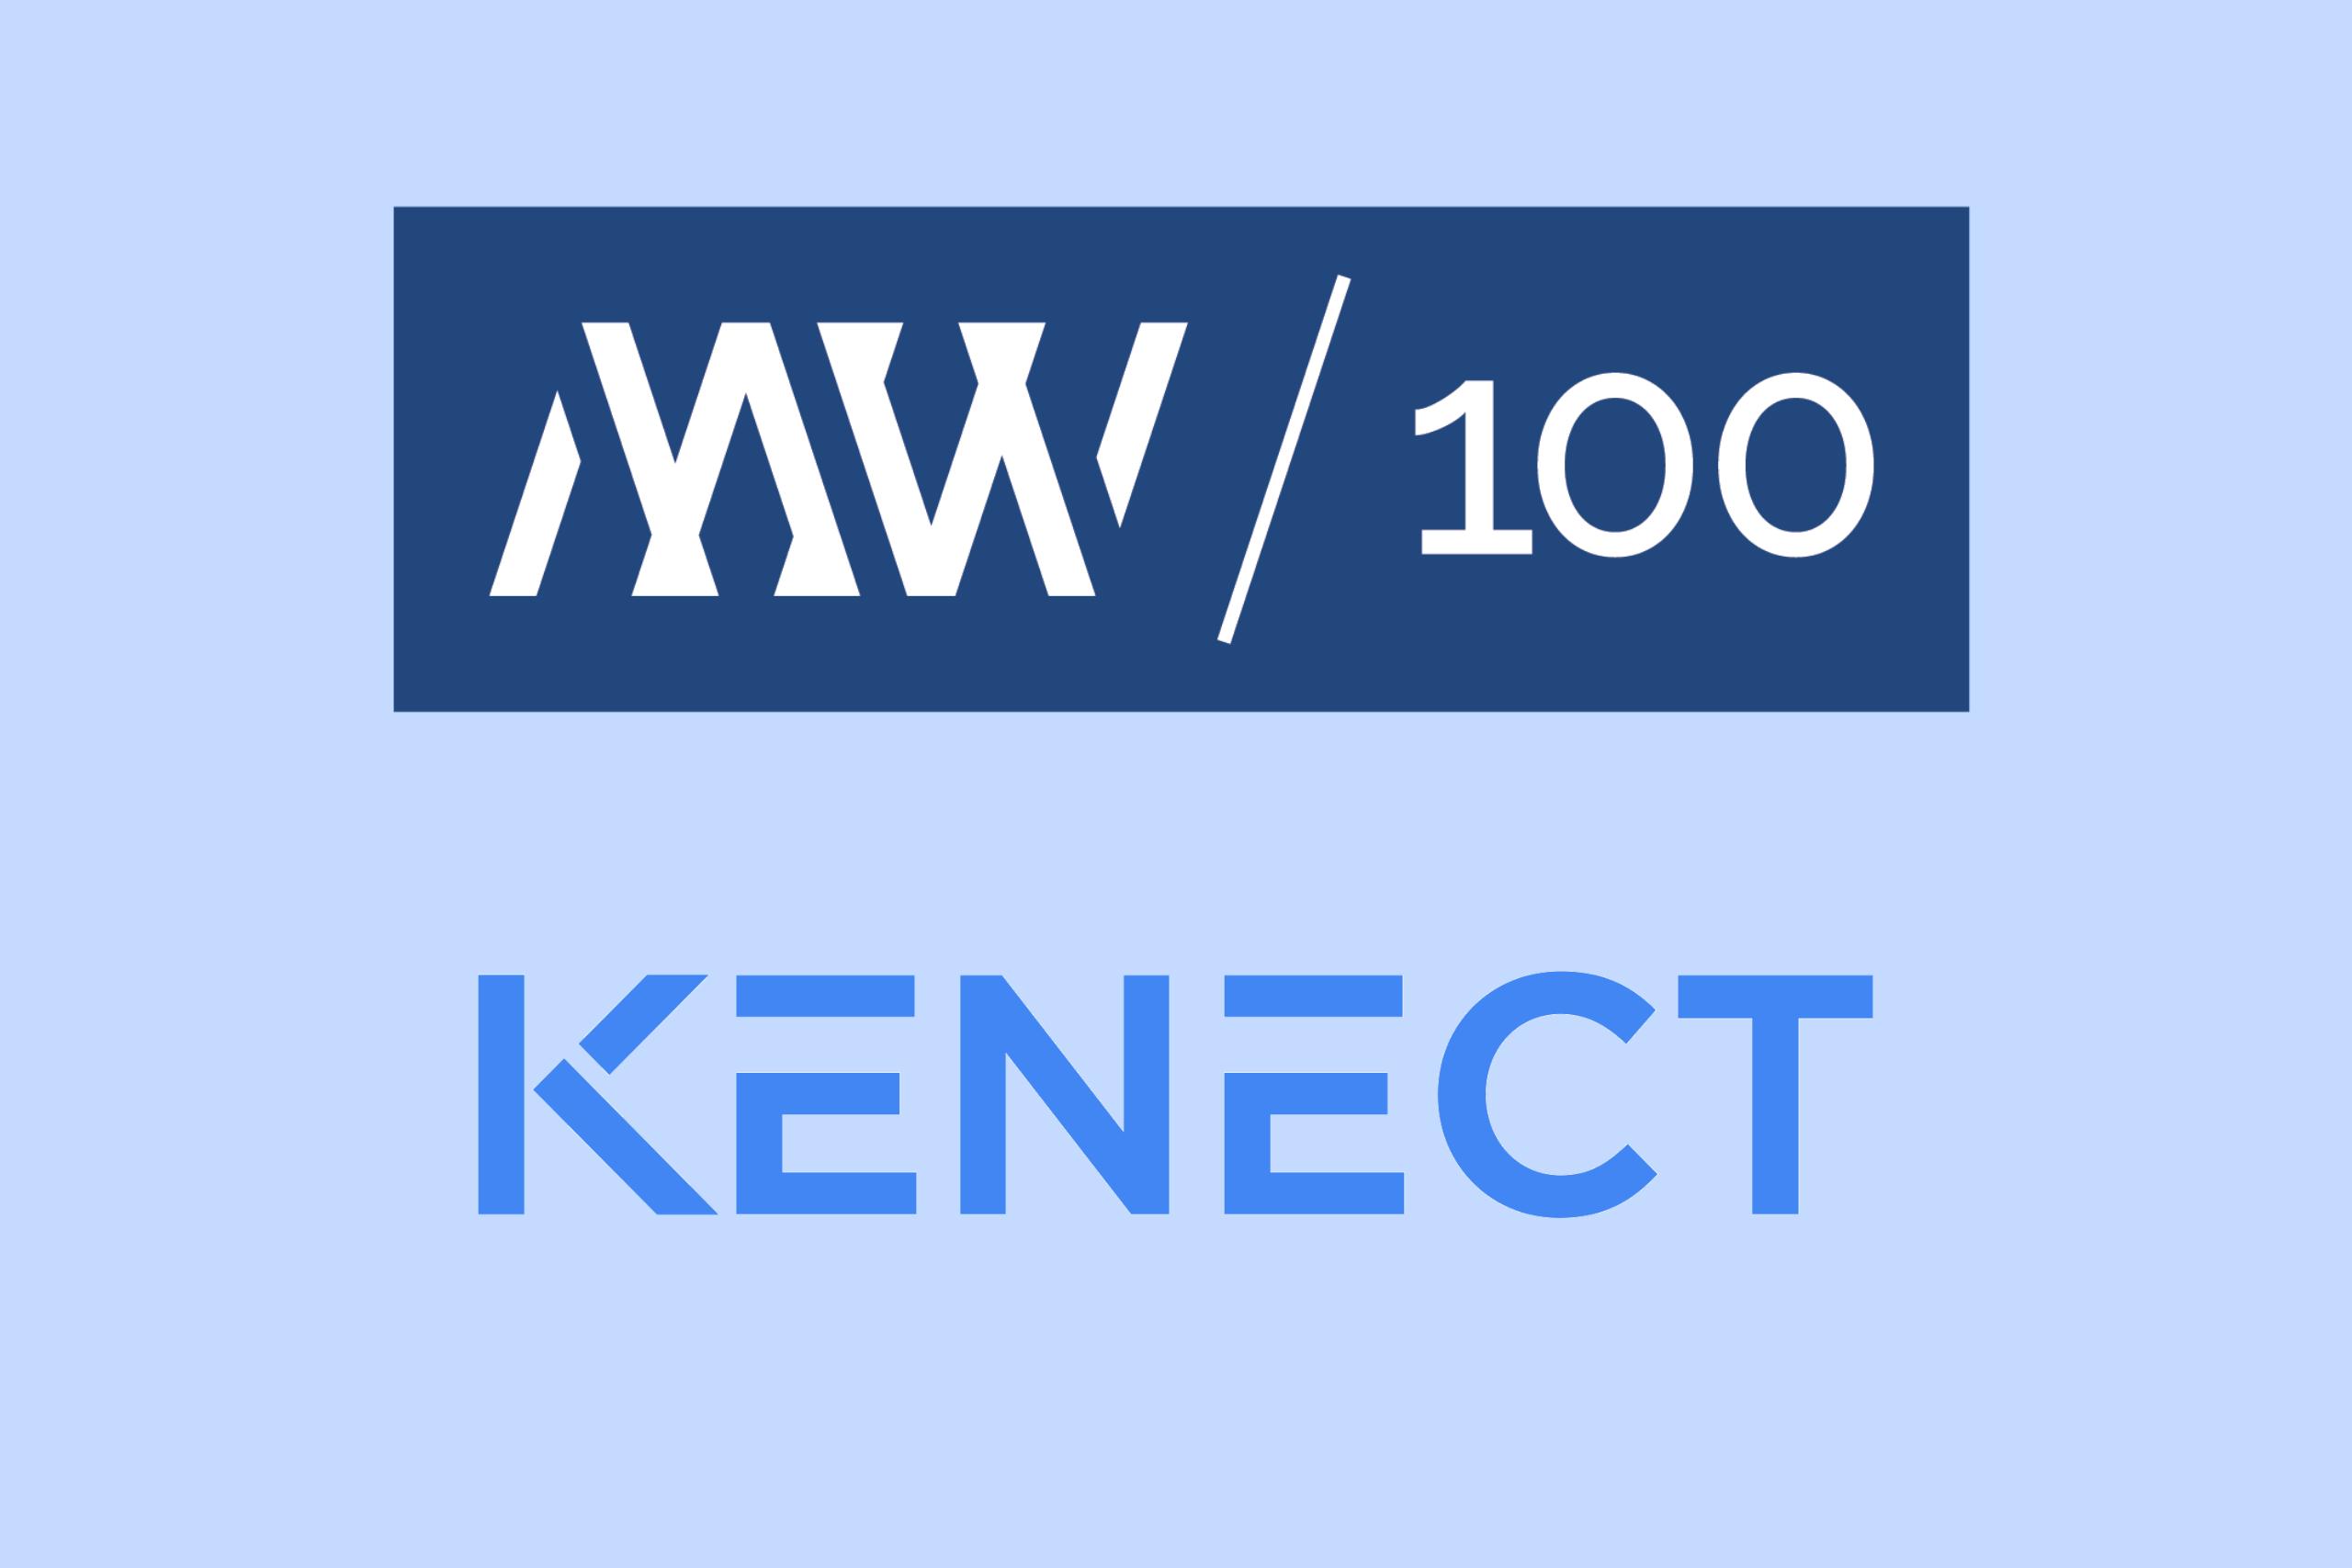 Kenect MWCN Top 100 Companies